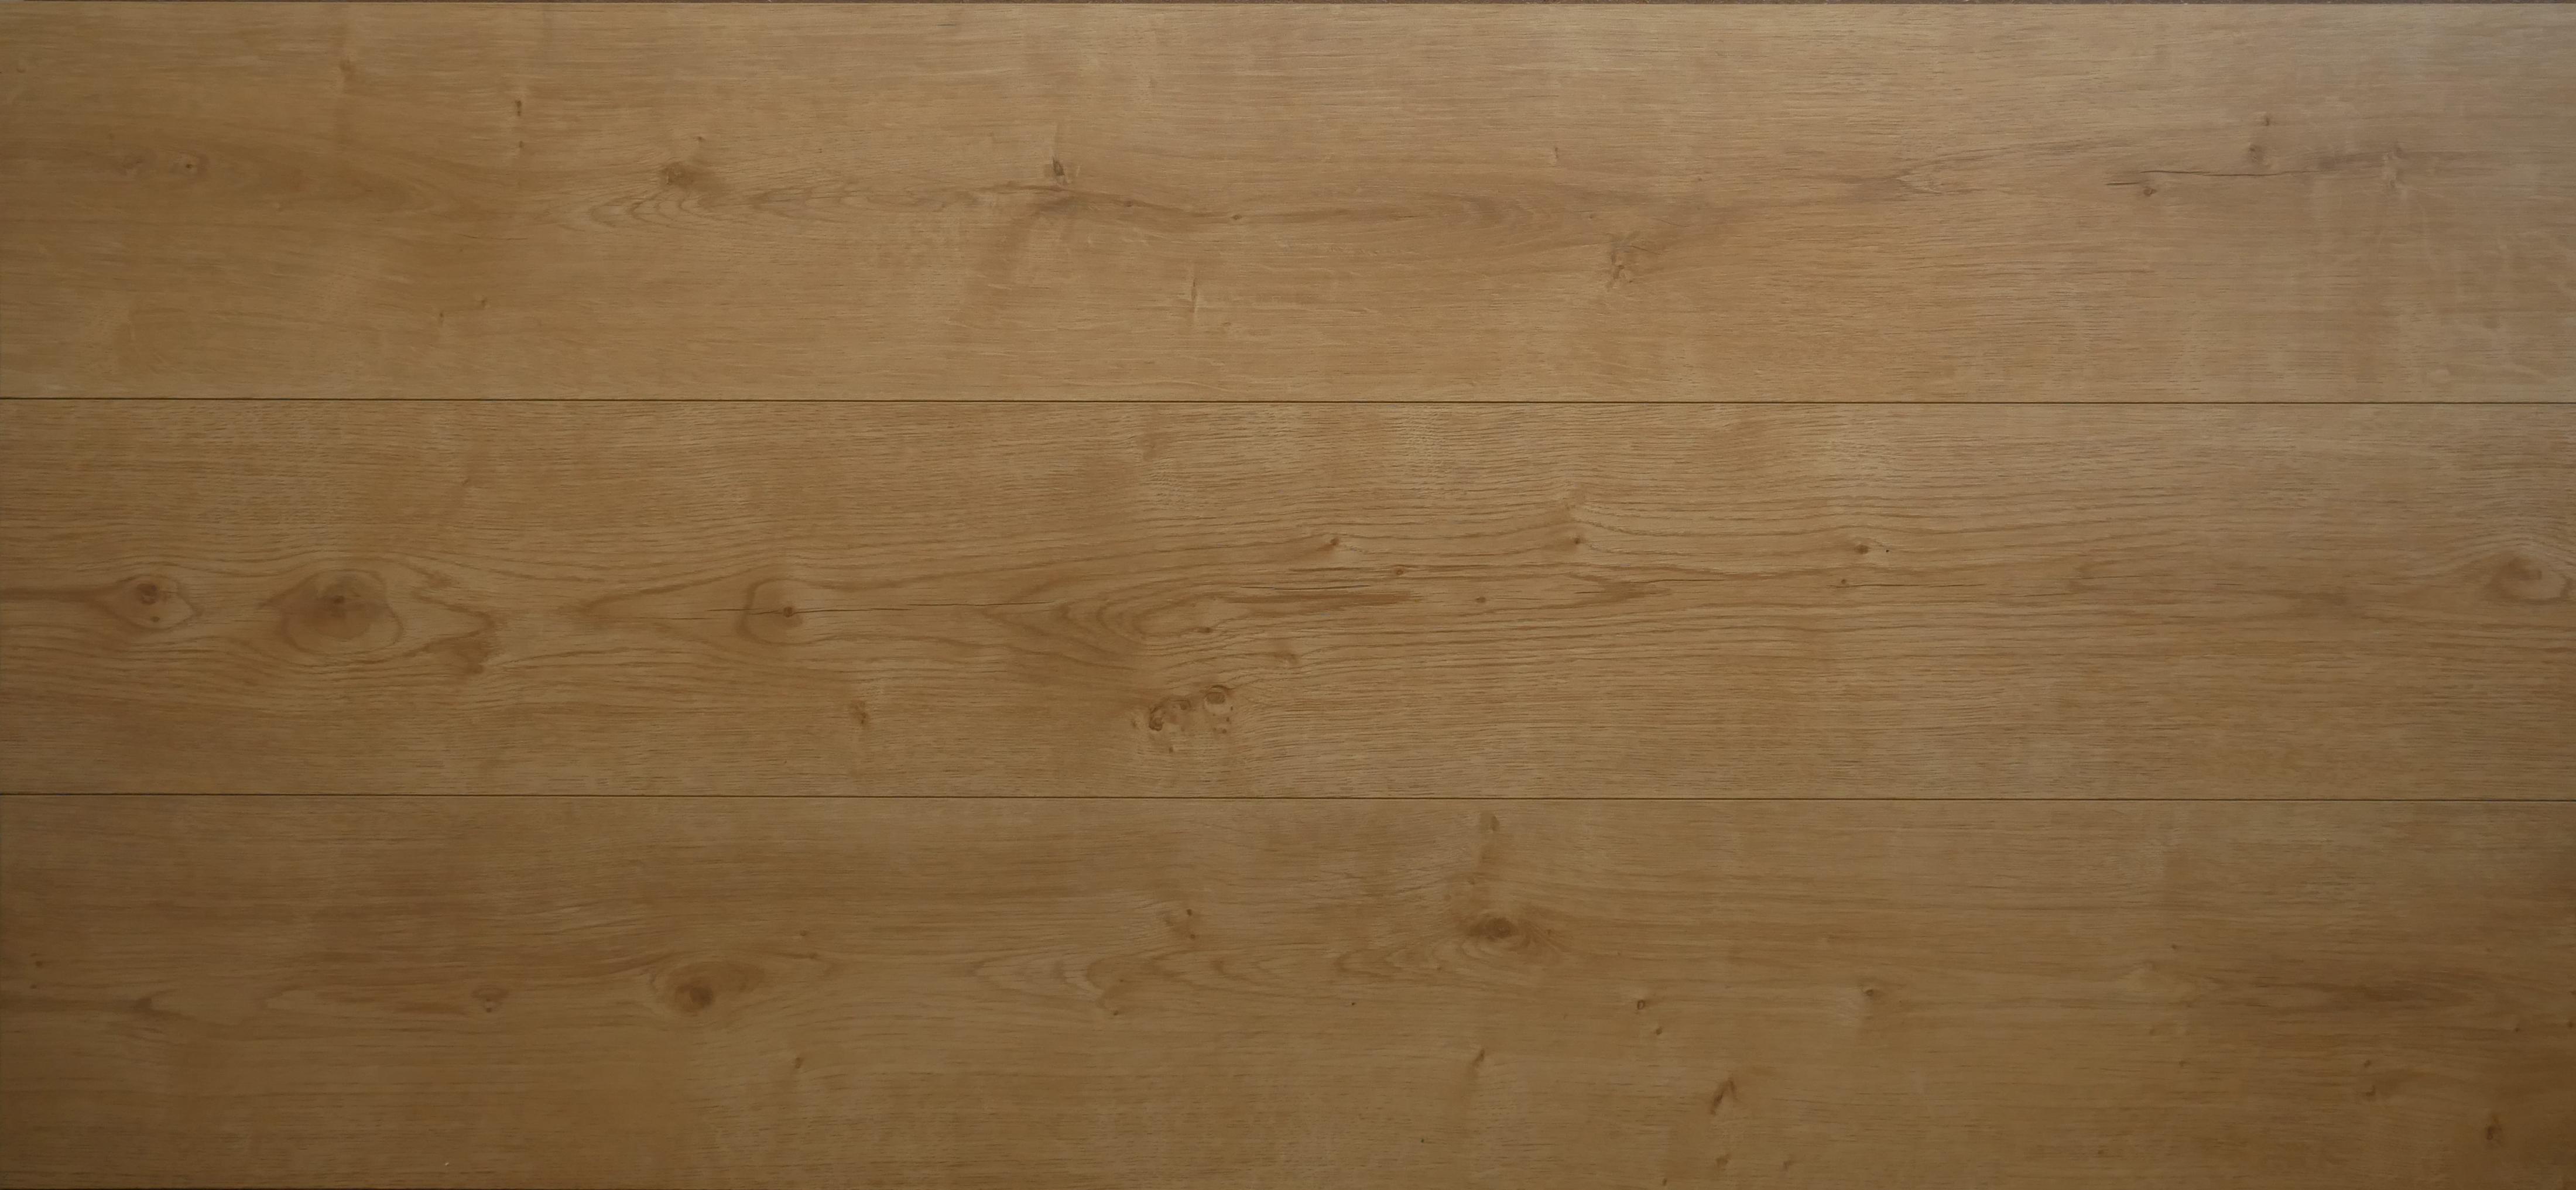 Sun Floors Imports- Chestnut Gold